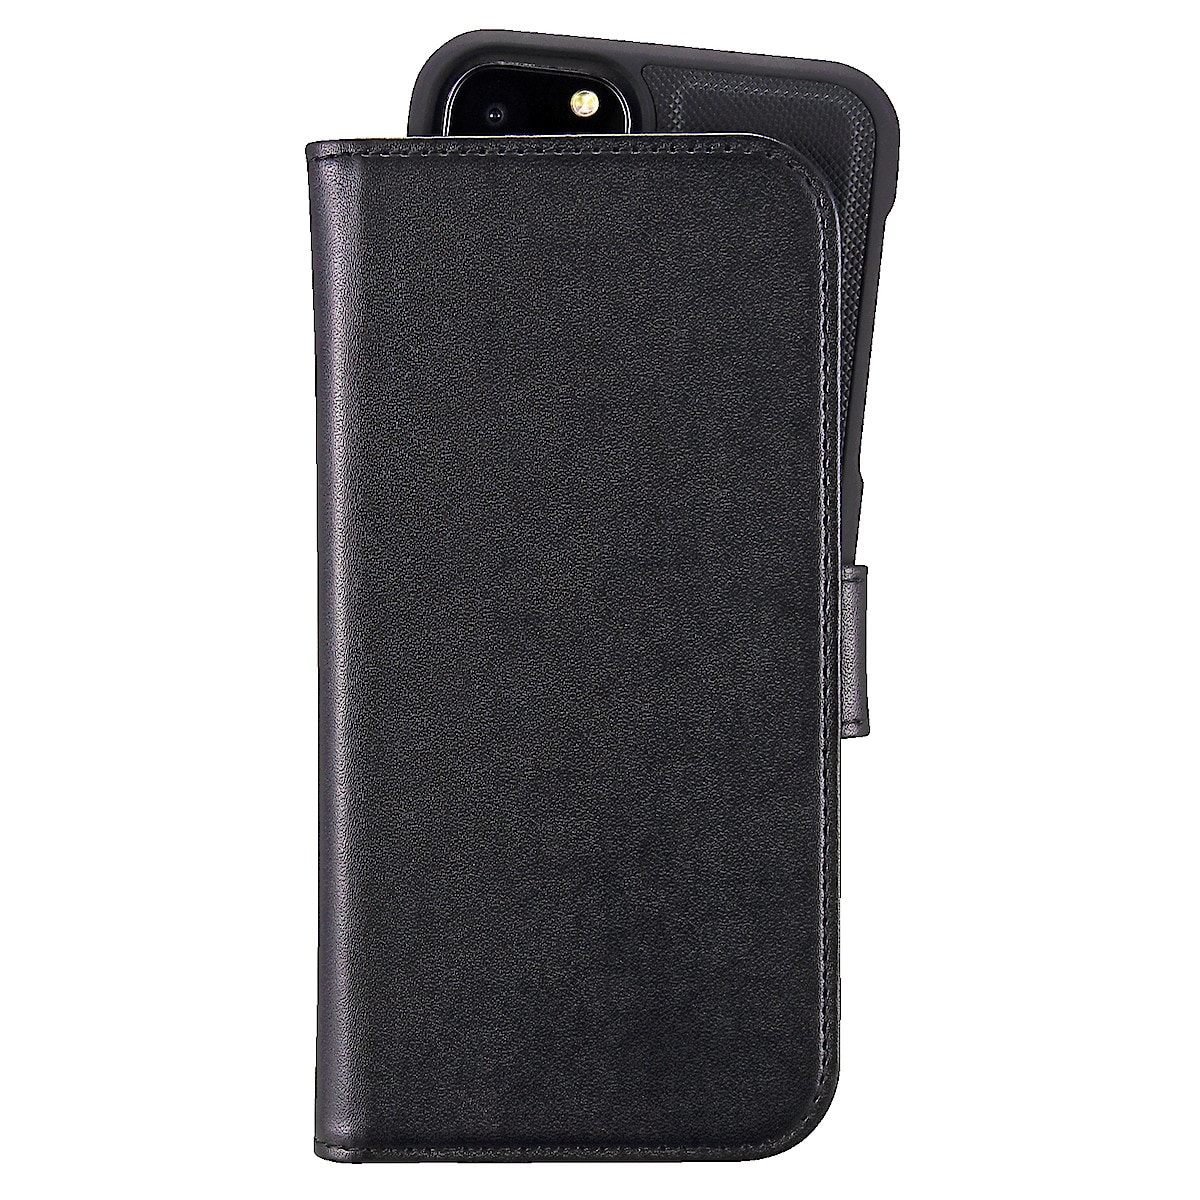 Plånboksfodral för iPhone 11 Pro Holdit